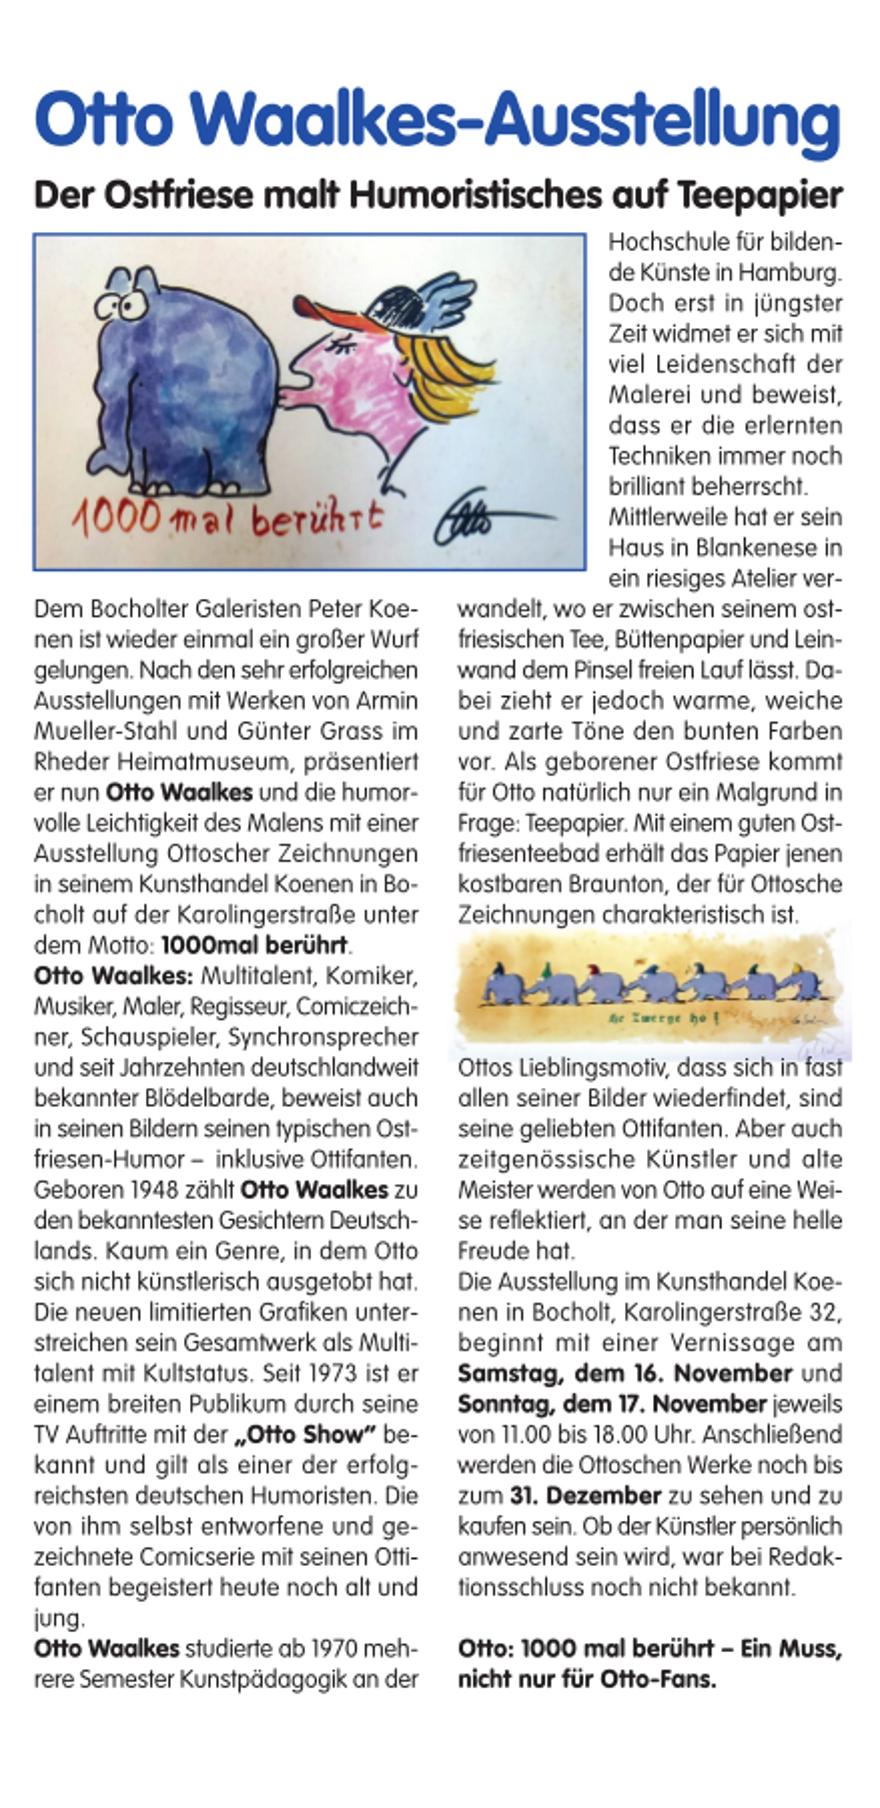 Bericht Kunsthandel Koenen Rheder Stadtgespraech1 - Otto Waalkes